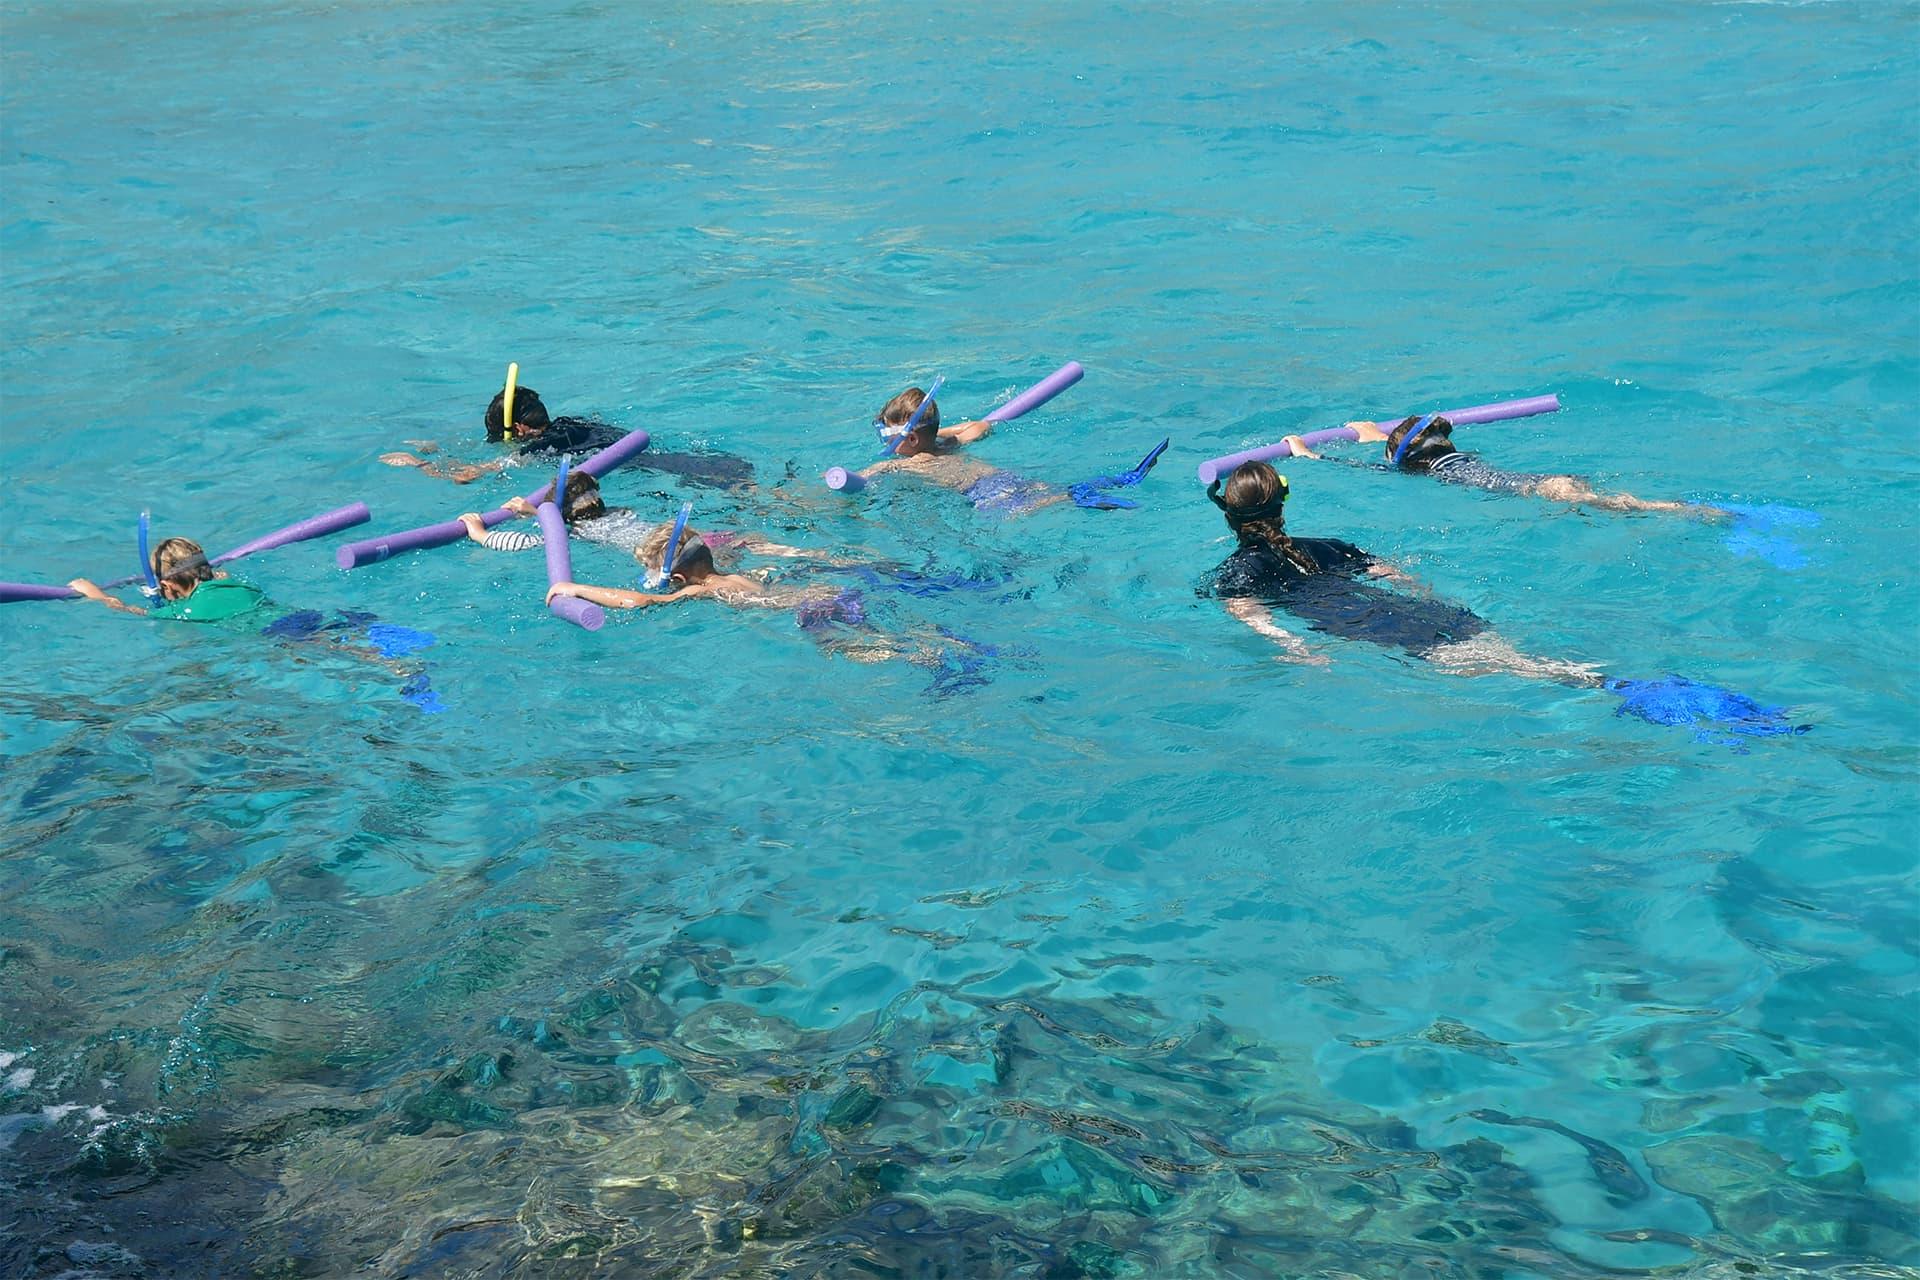 Children's enjoying snorkeling during the snorkel club at the Curaçao Sea Aquarium.